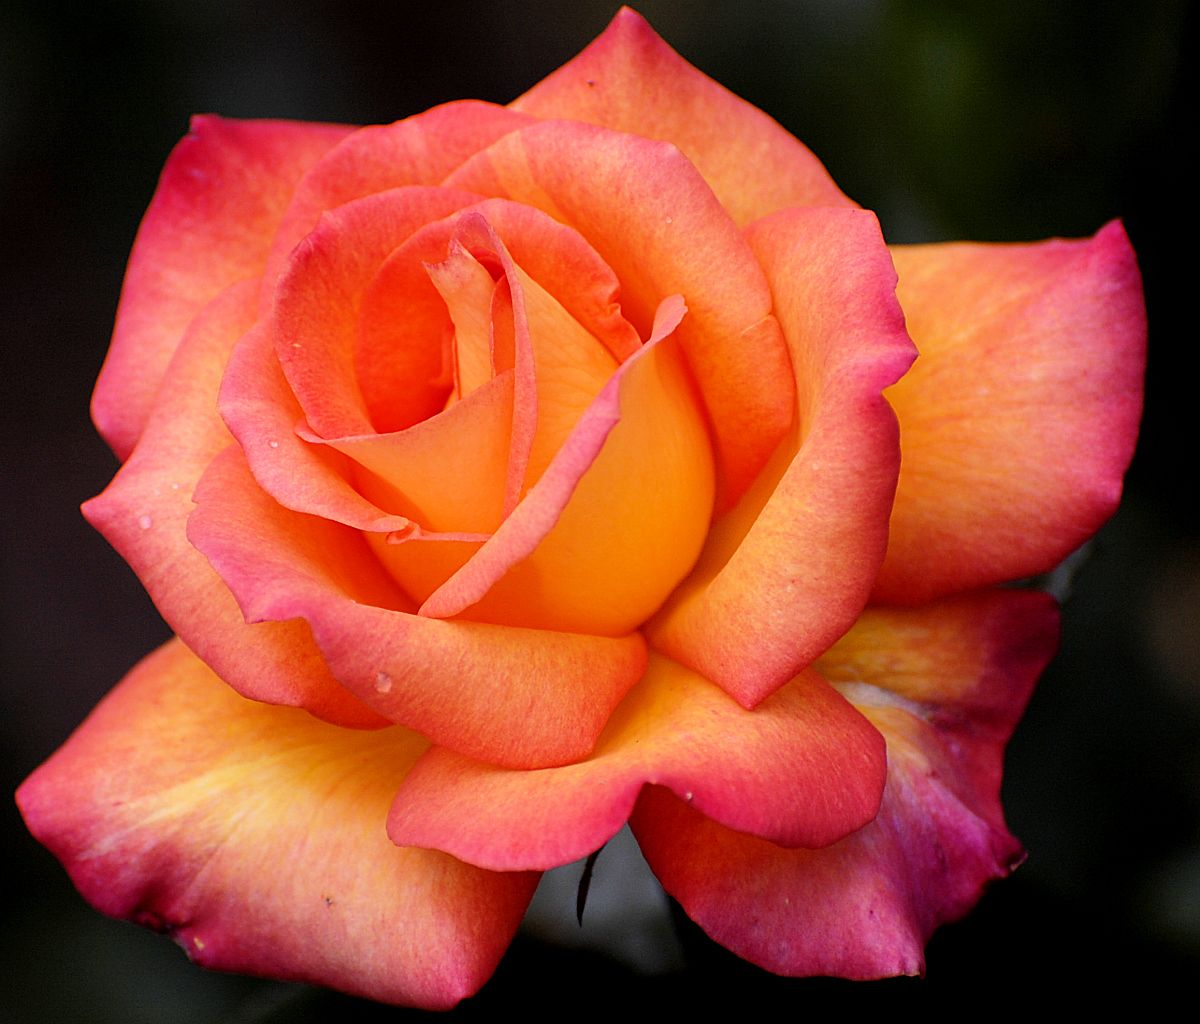 Rose Flower Picture Wallpaper Hd Wallpaper Wallpapermine Com